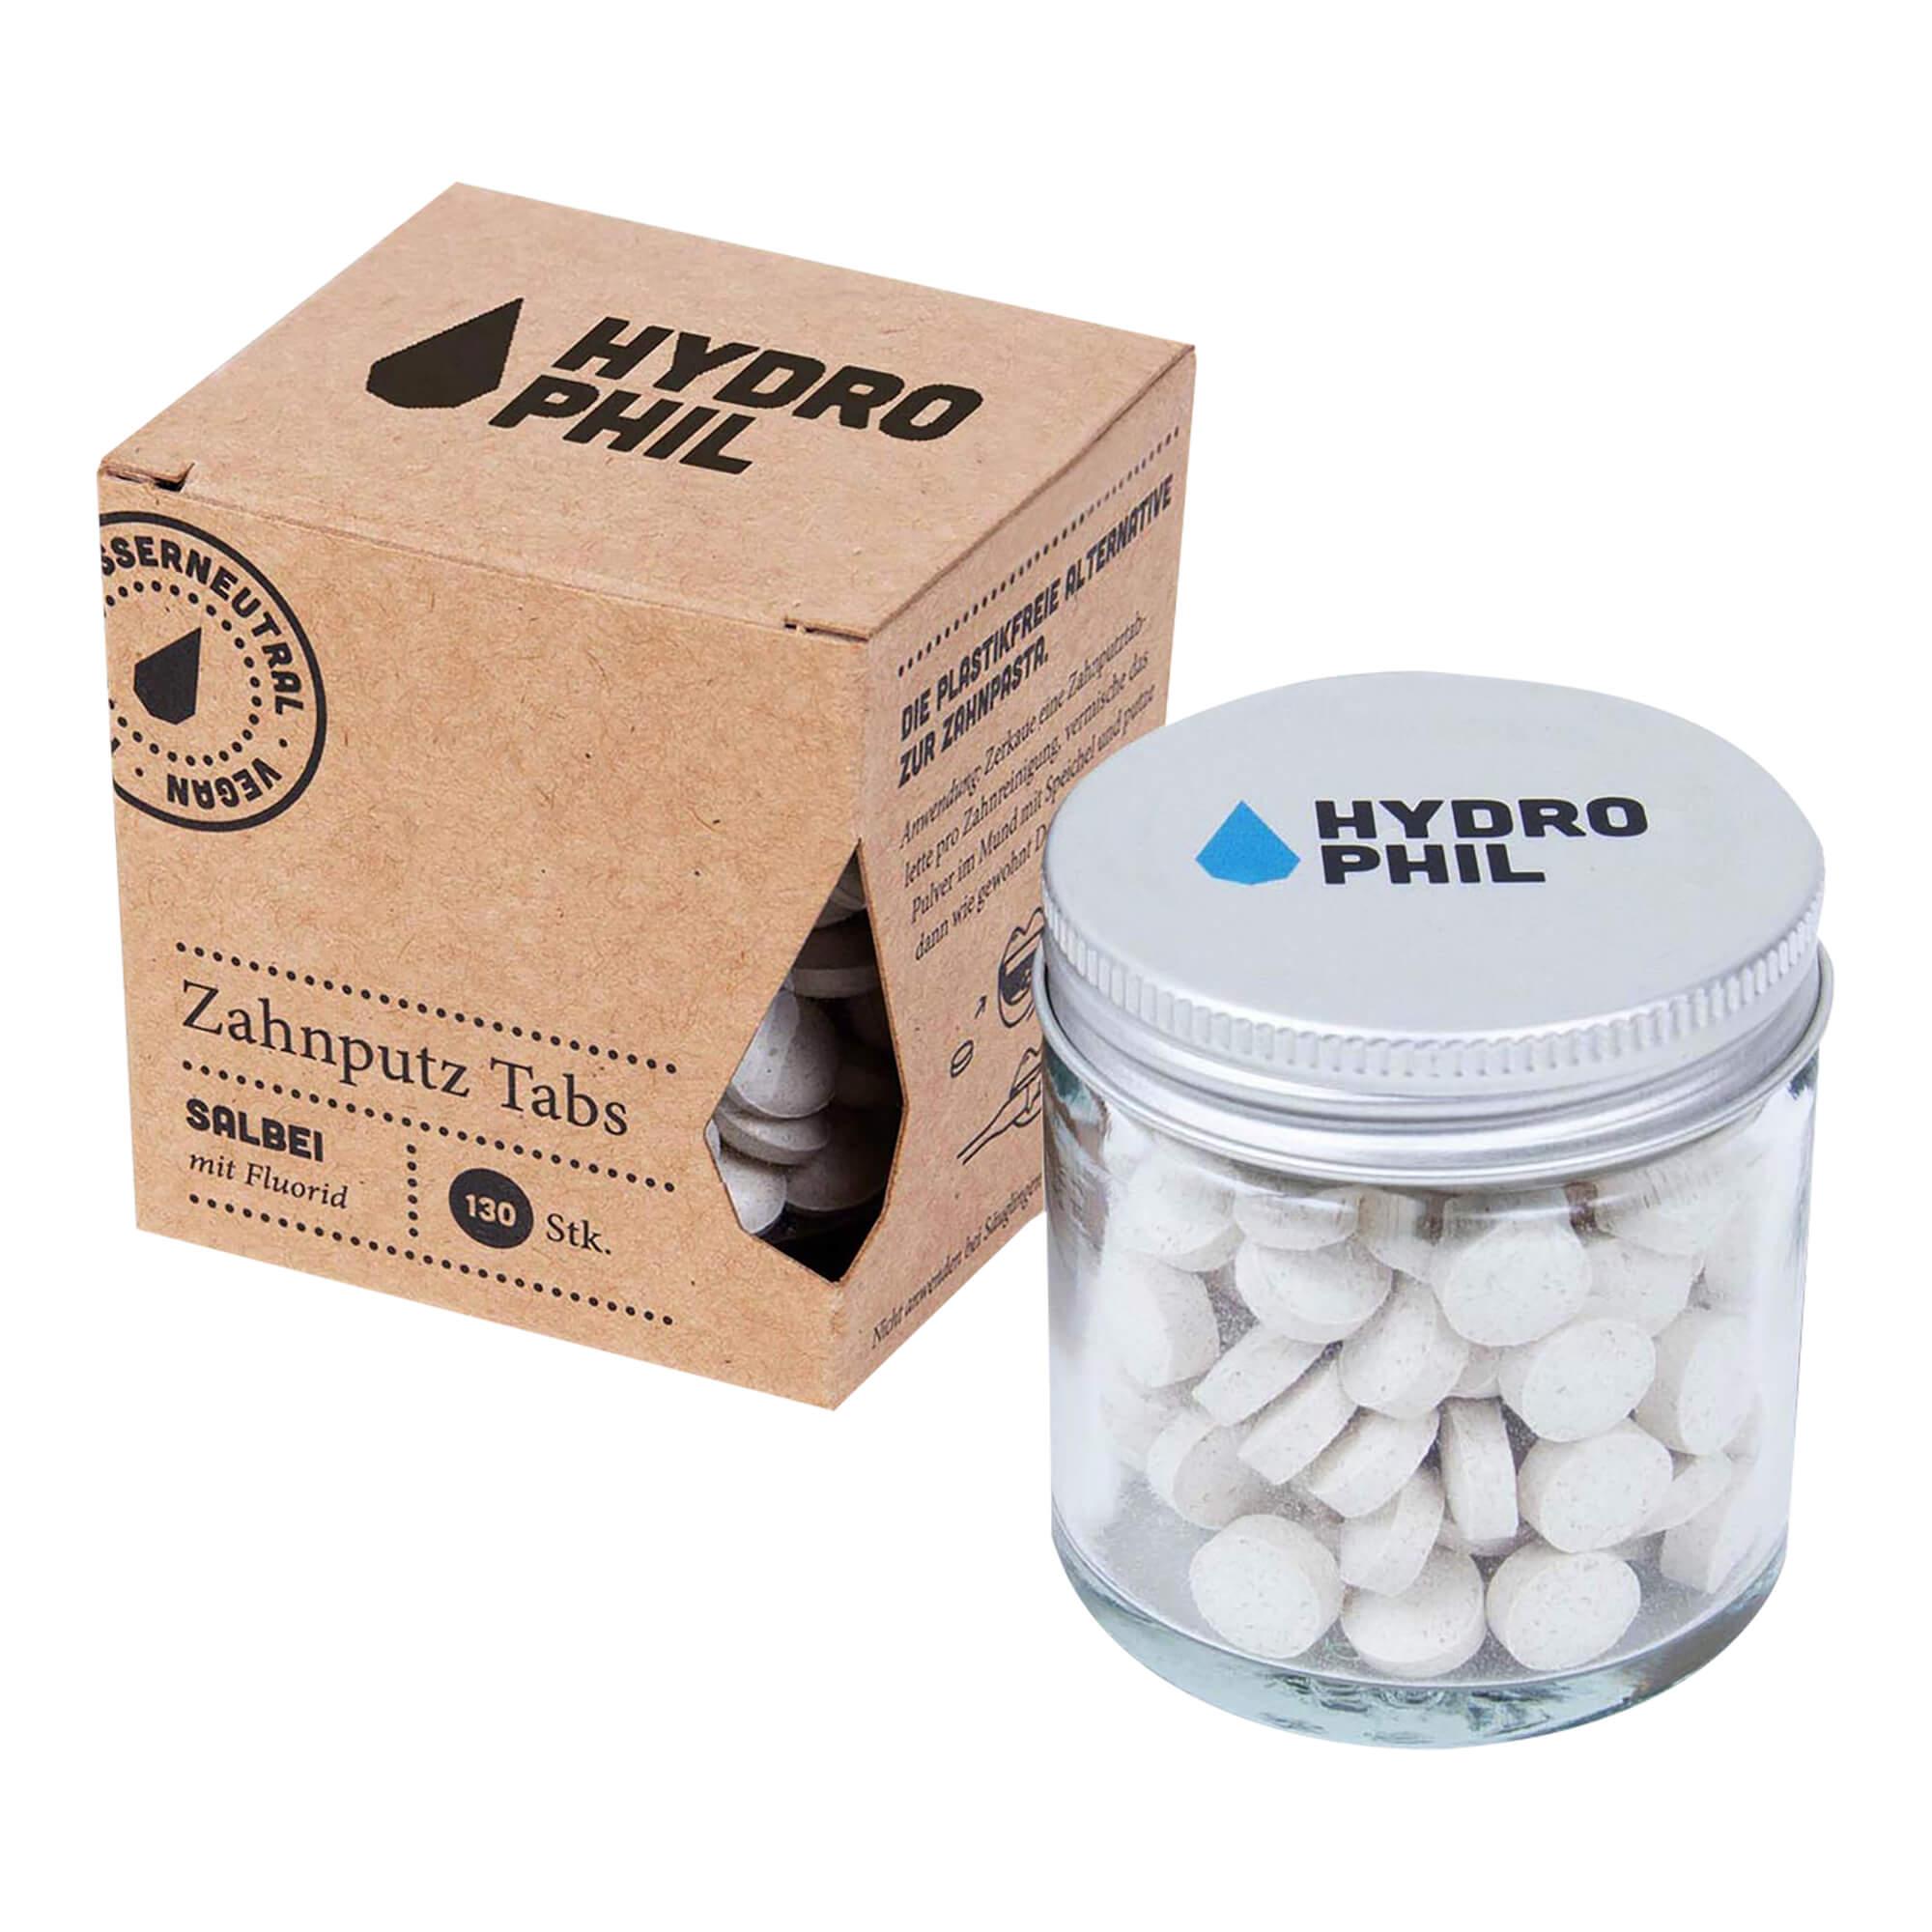 Zahnputz-Tabs Salbei mit Fluorid